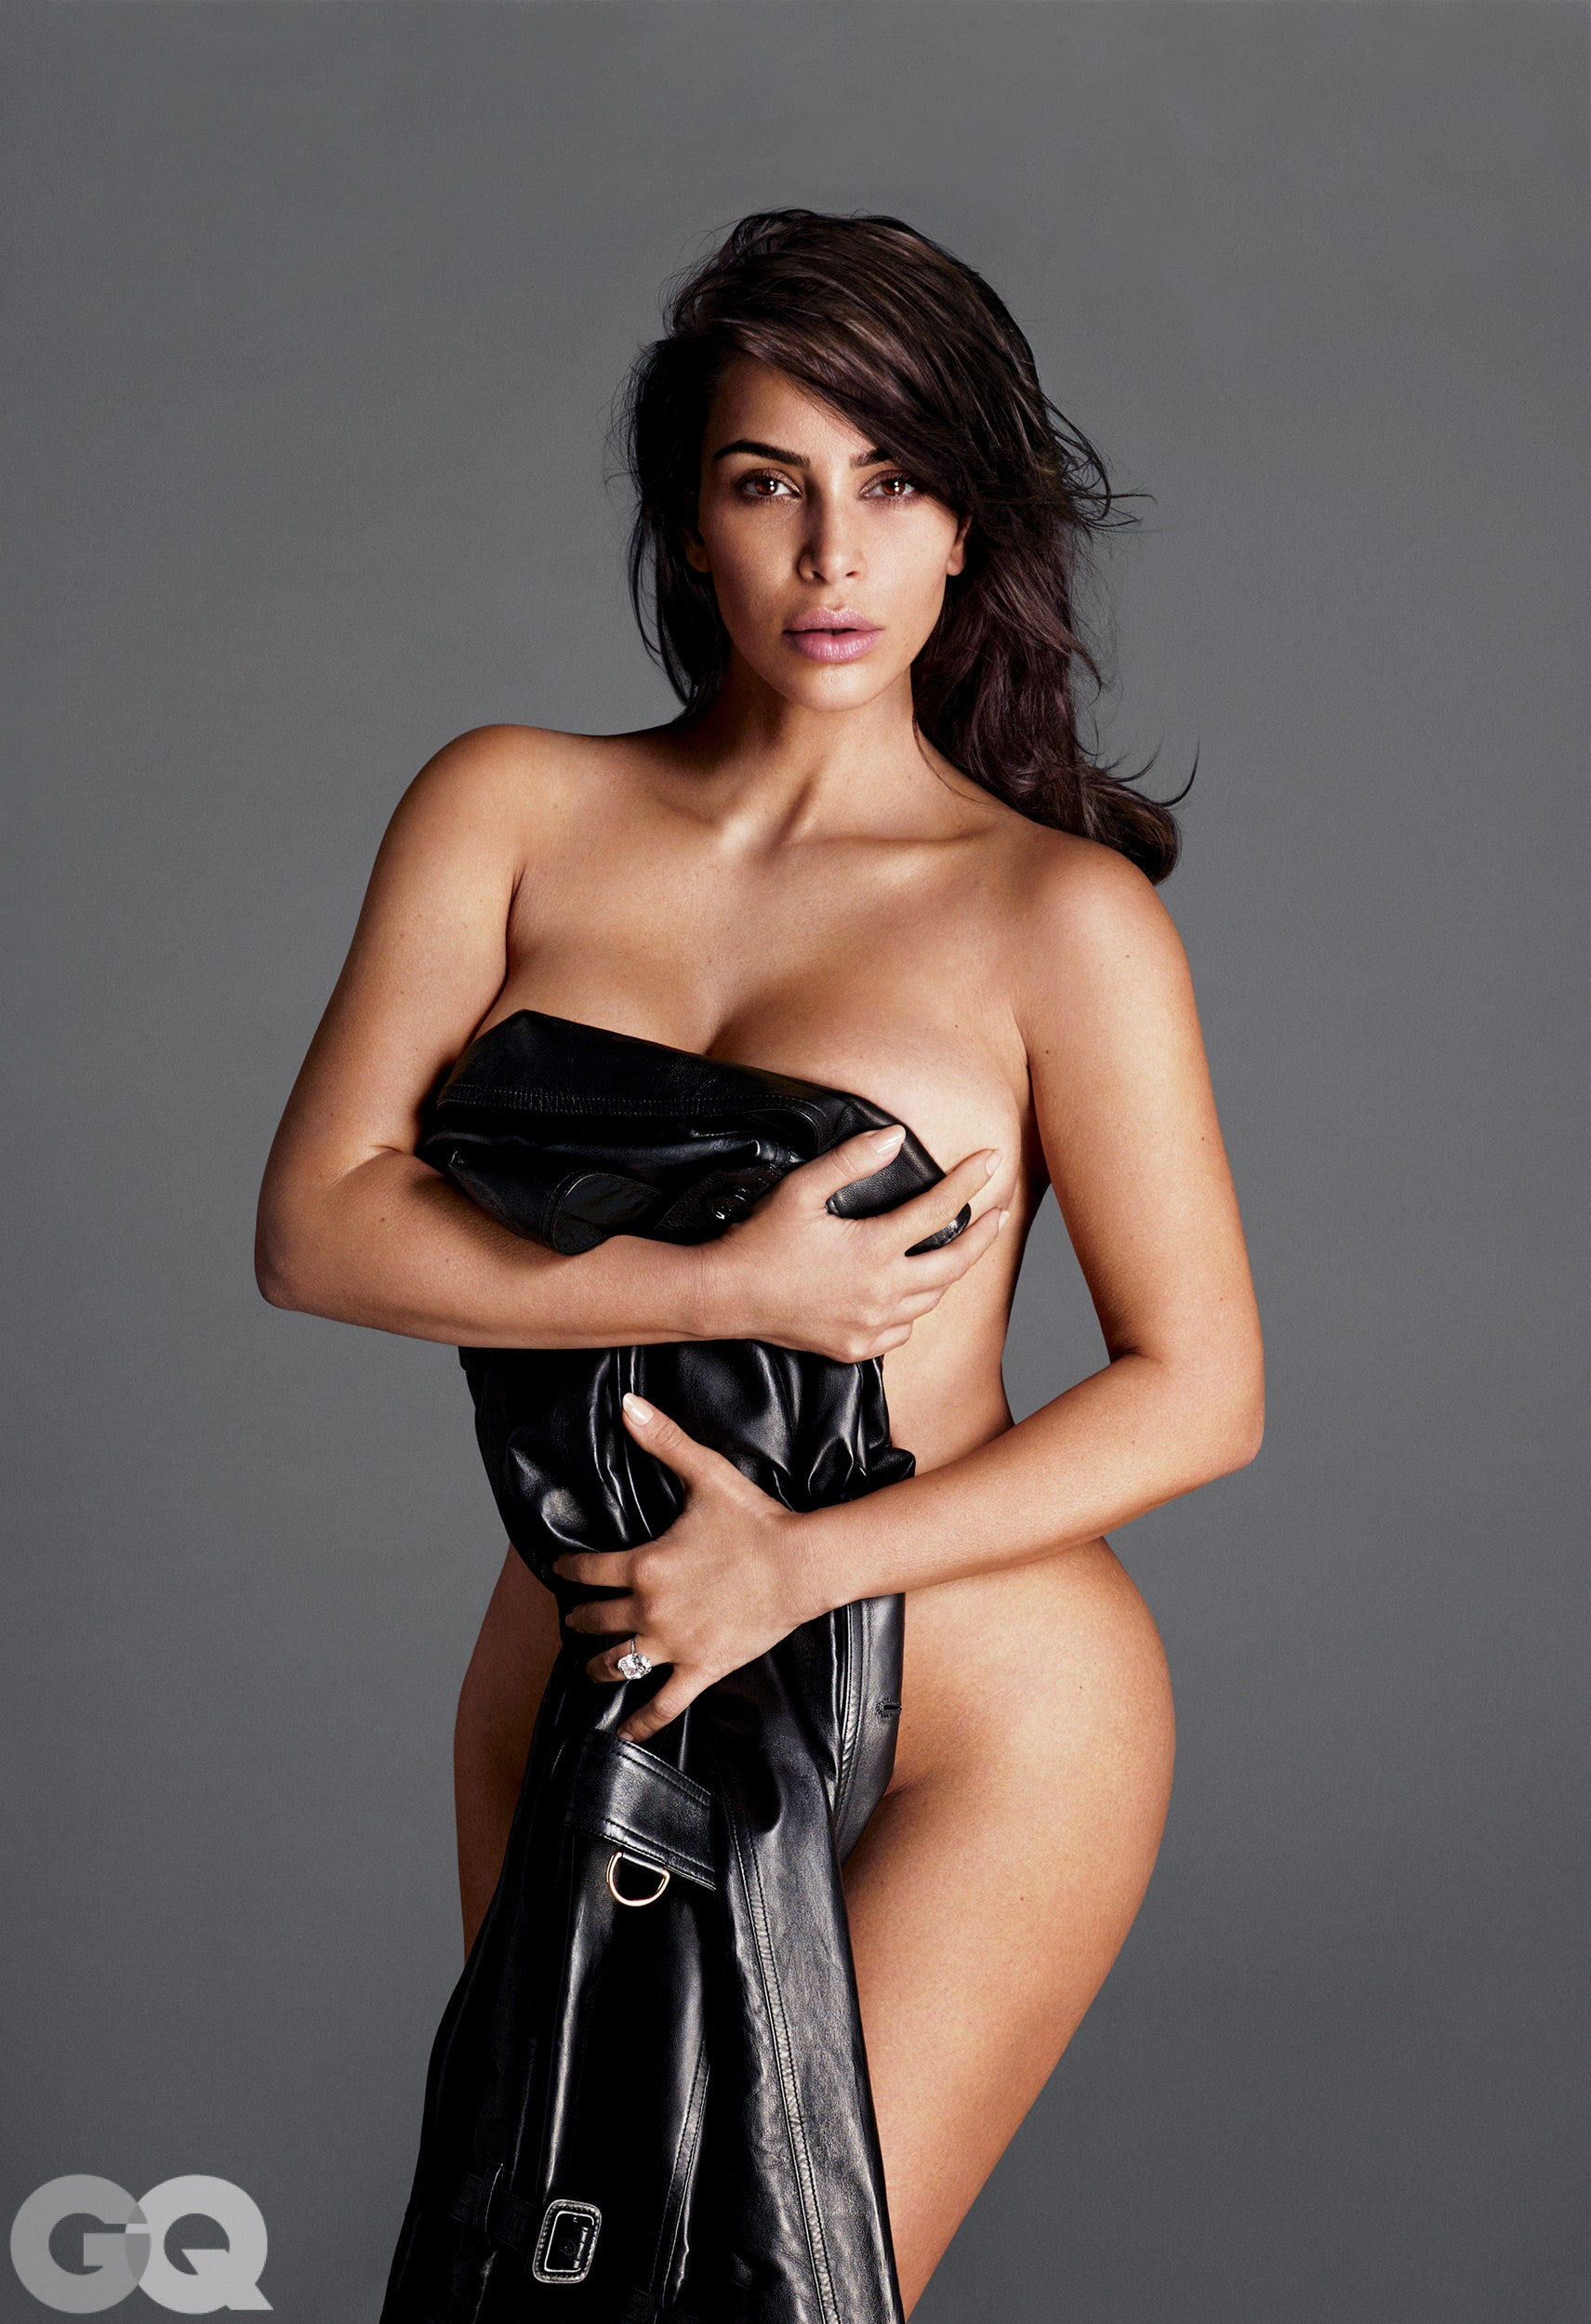 Nove fotografije gole Kim Kardashian  Kk-gq-0716-watermark-12